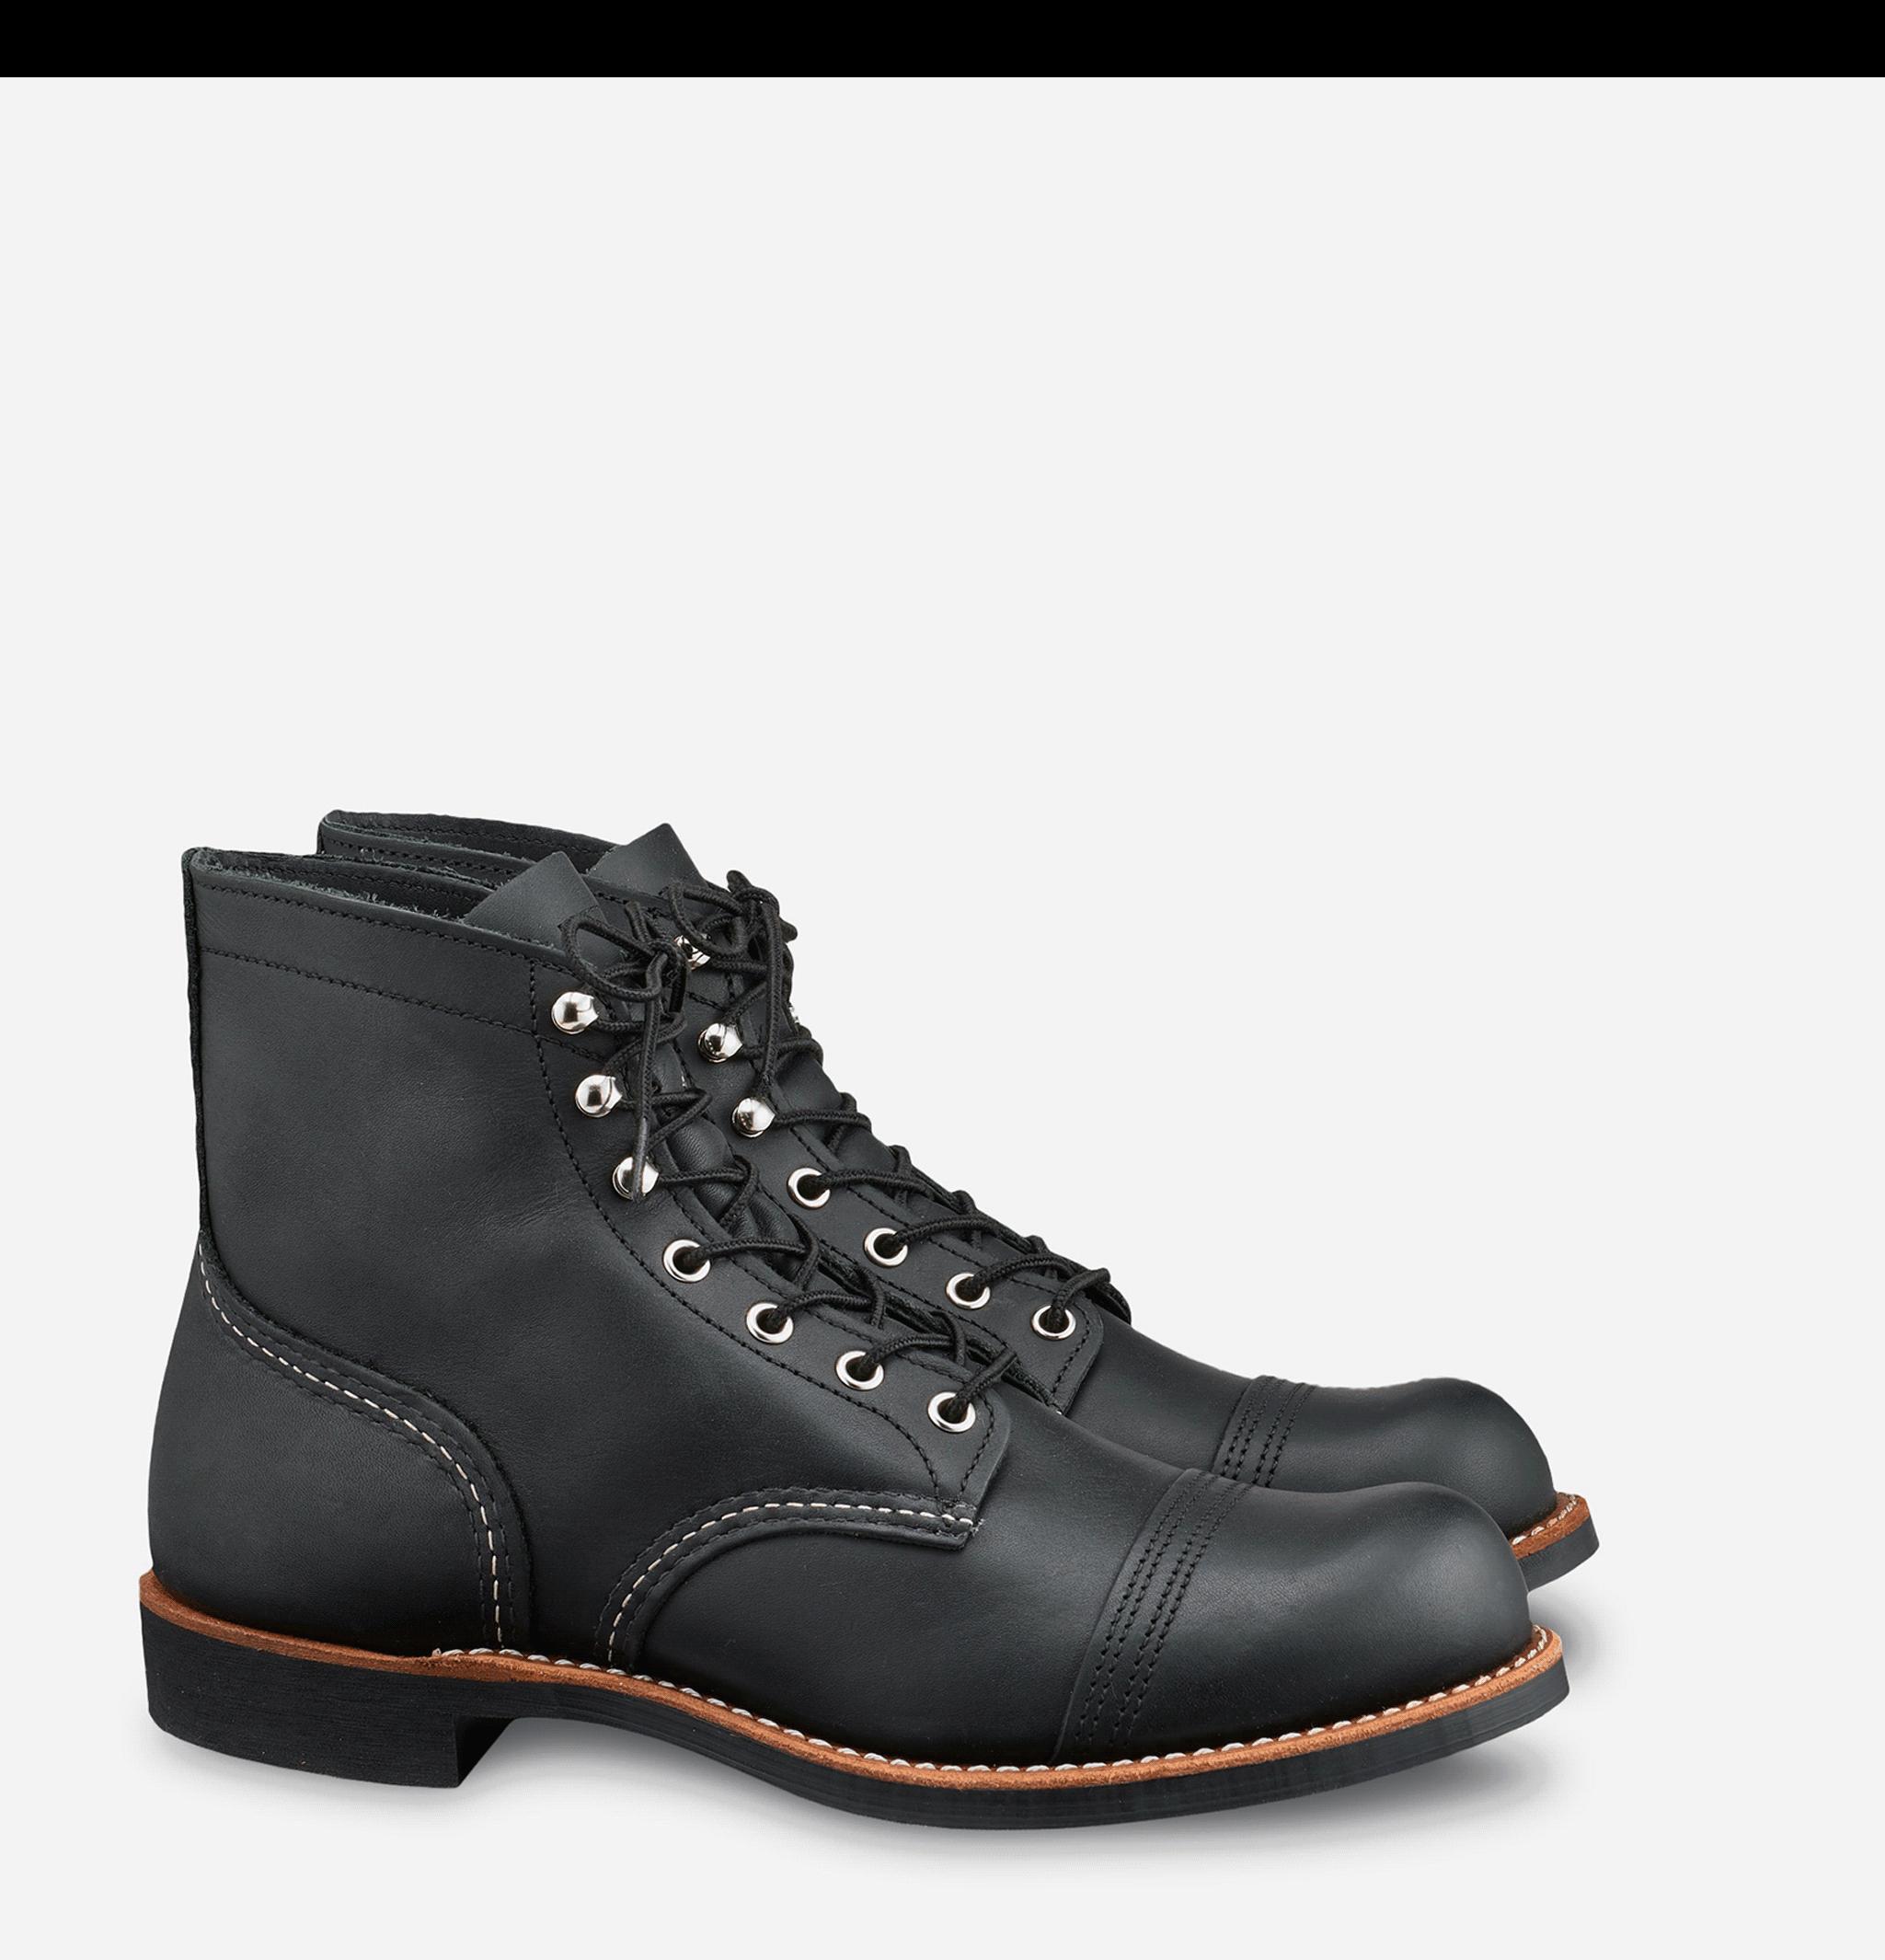 8084 - Iron Ranger Black...